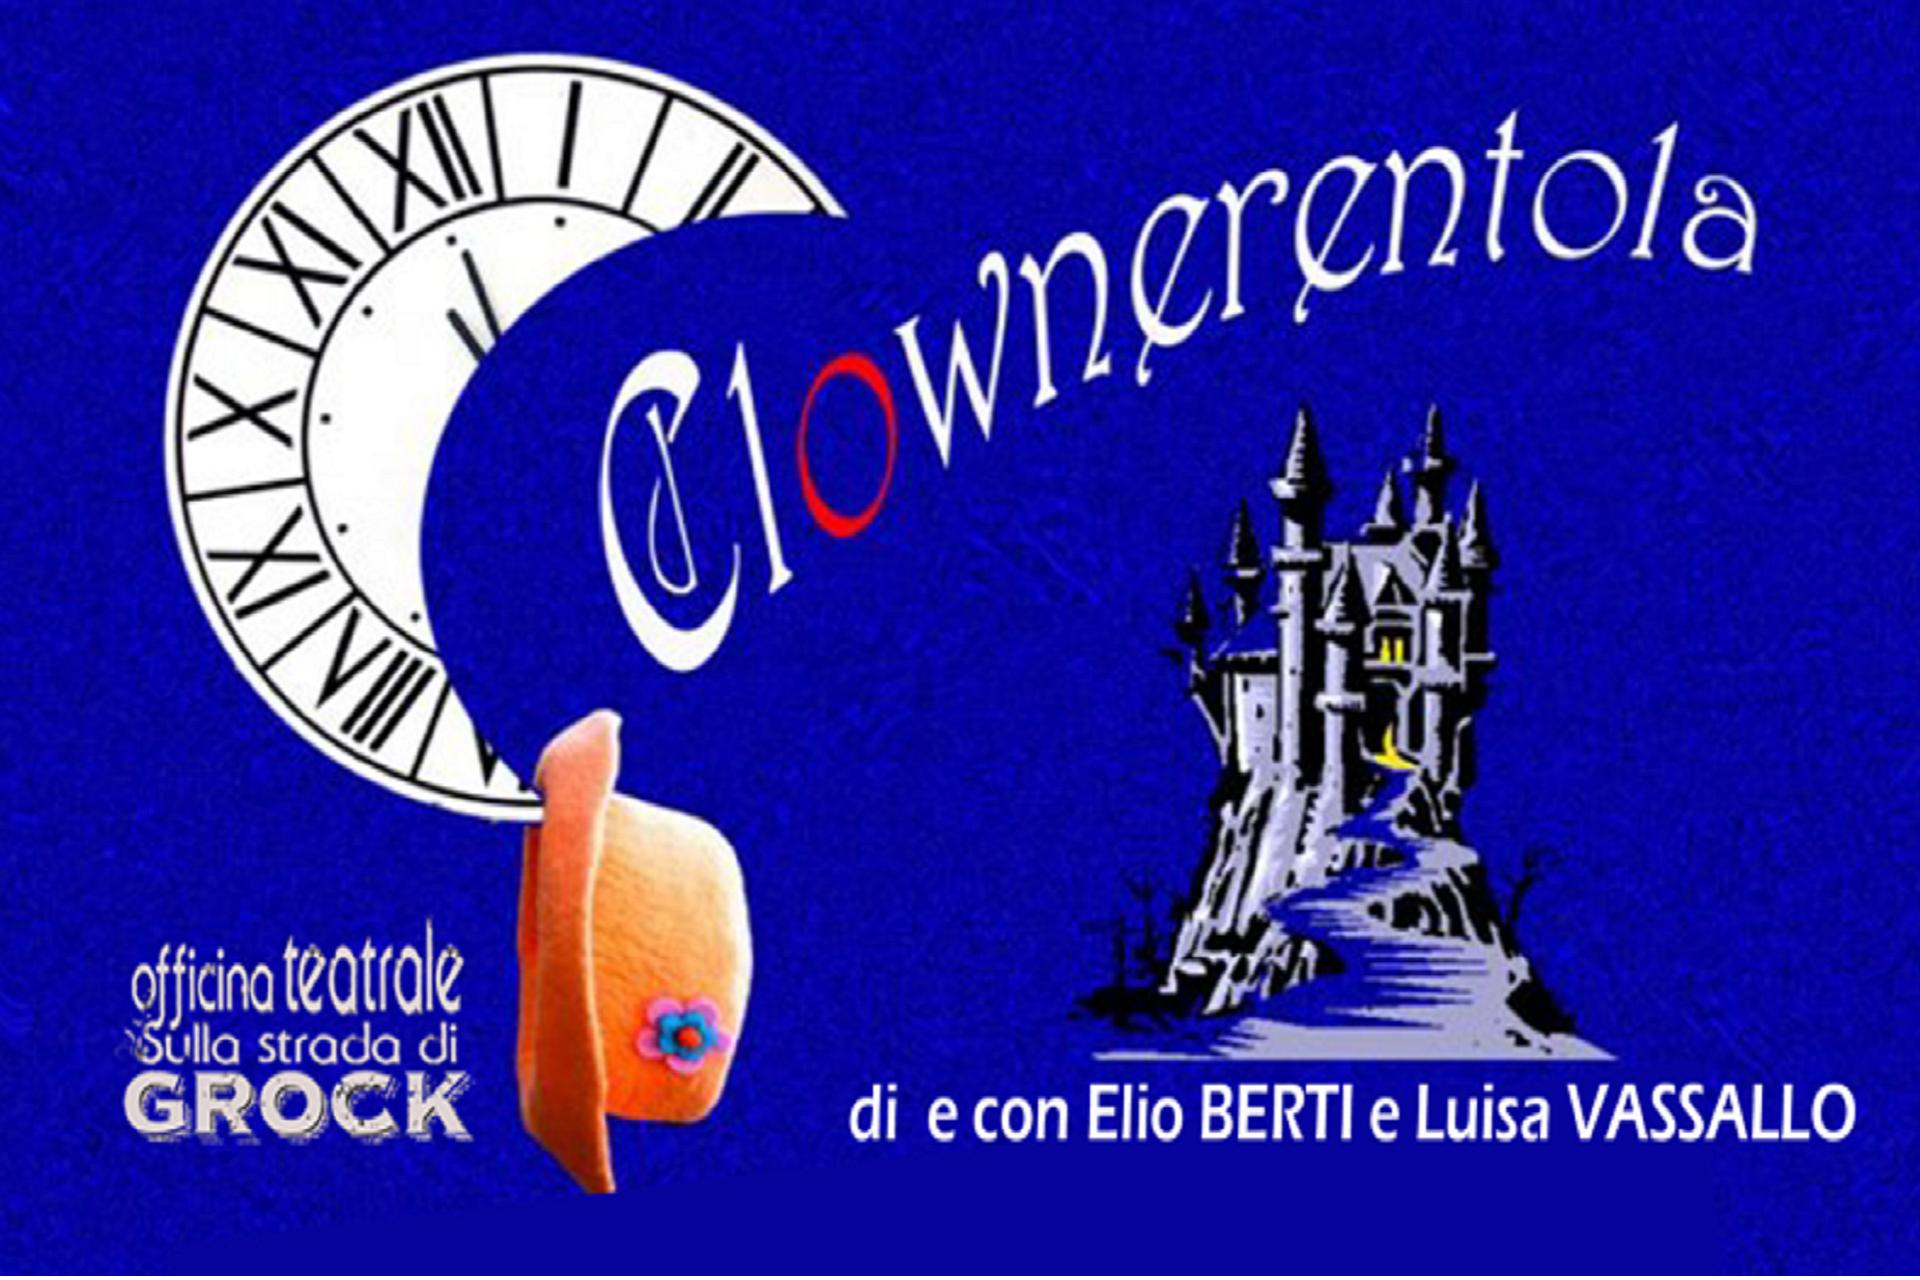 Clownerentola - Residenza Sanitaria Assistenziale Santuario - Opere Sociali Servizi Savona